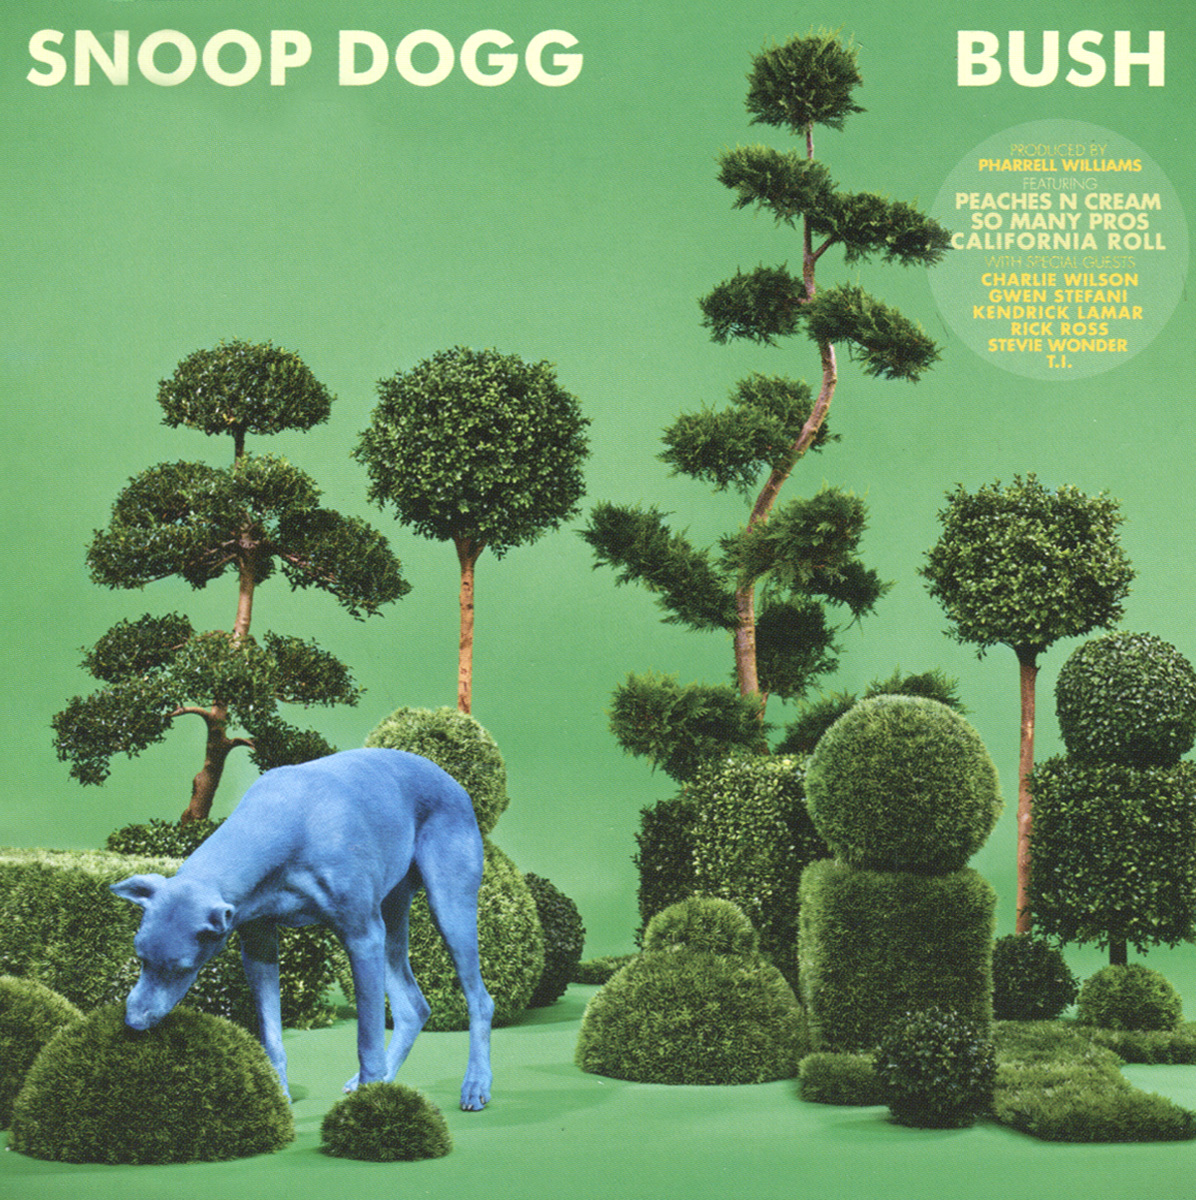 Снуп Догги Догг Snoop Dogg. Bush snoop dogg snoop dogg bush